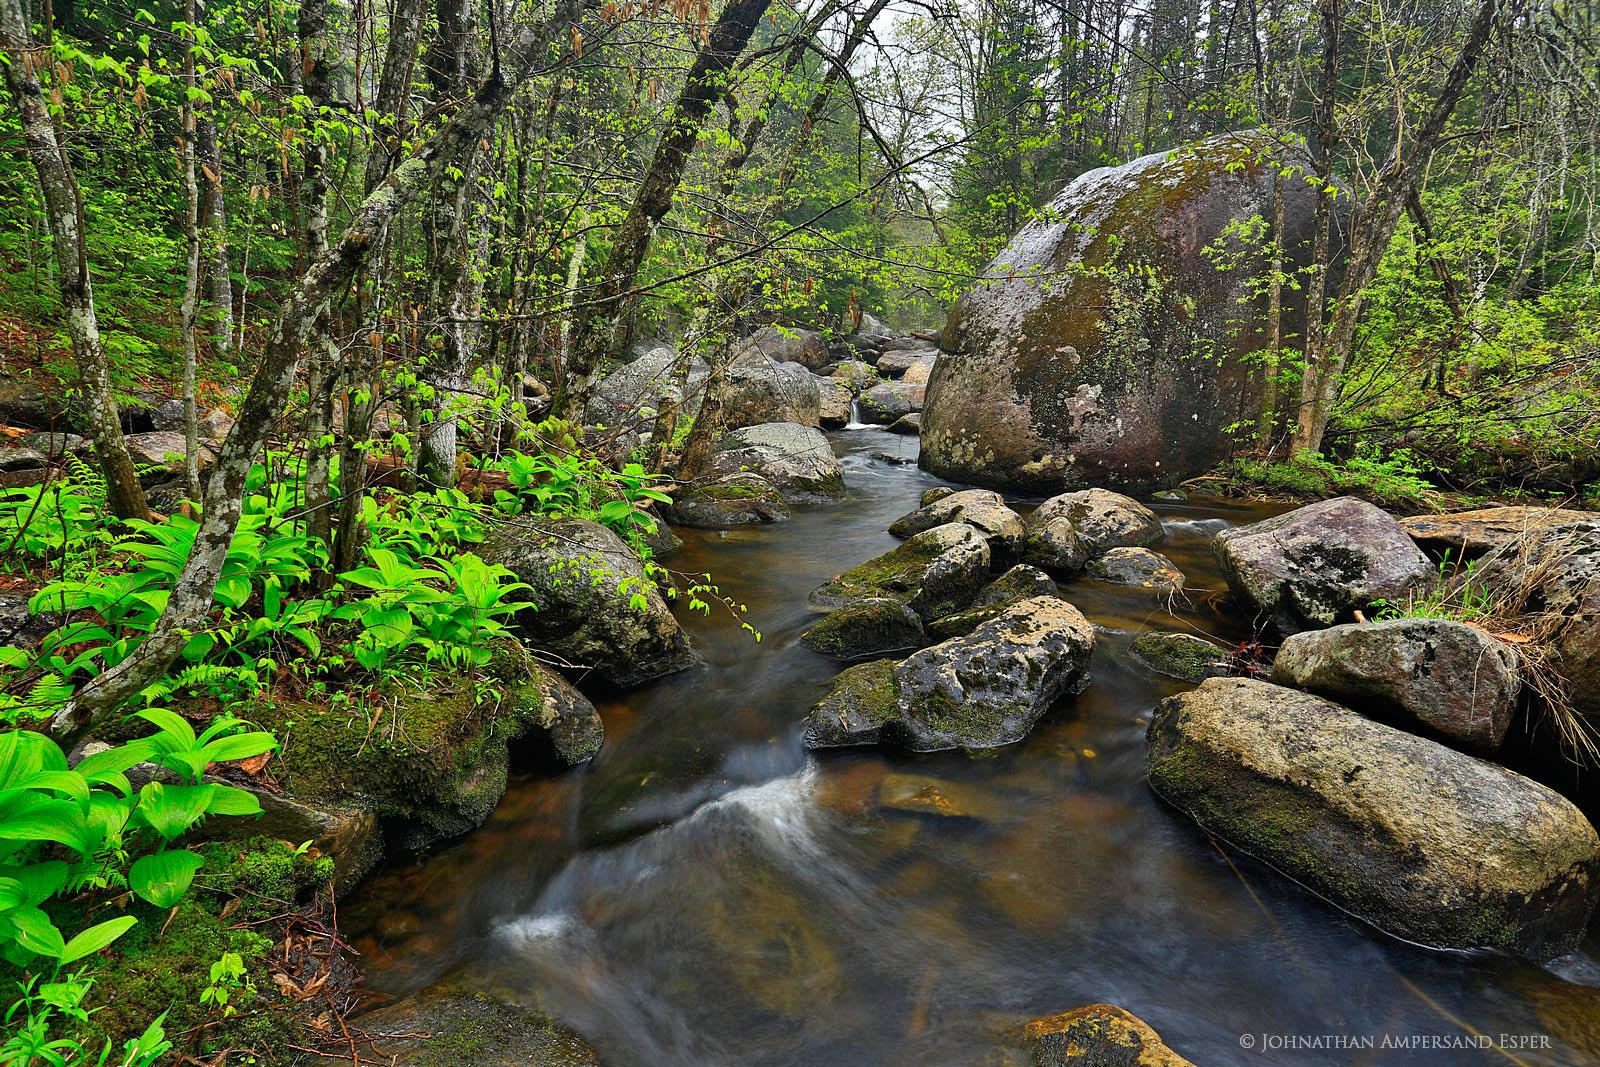 Georgia Brook,Sacandaga River,East Branch,tributary,river,stream,rainy,April,spring,wet,brook,Adirondack,Adirondack Park,, photo